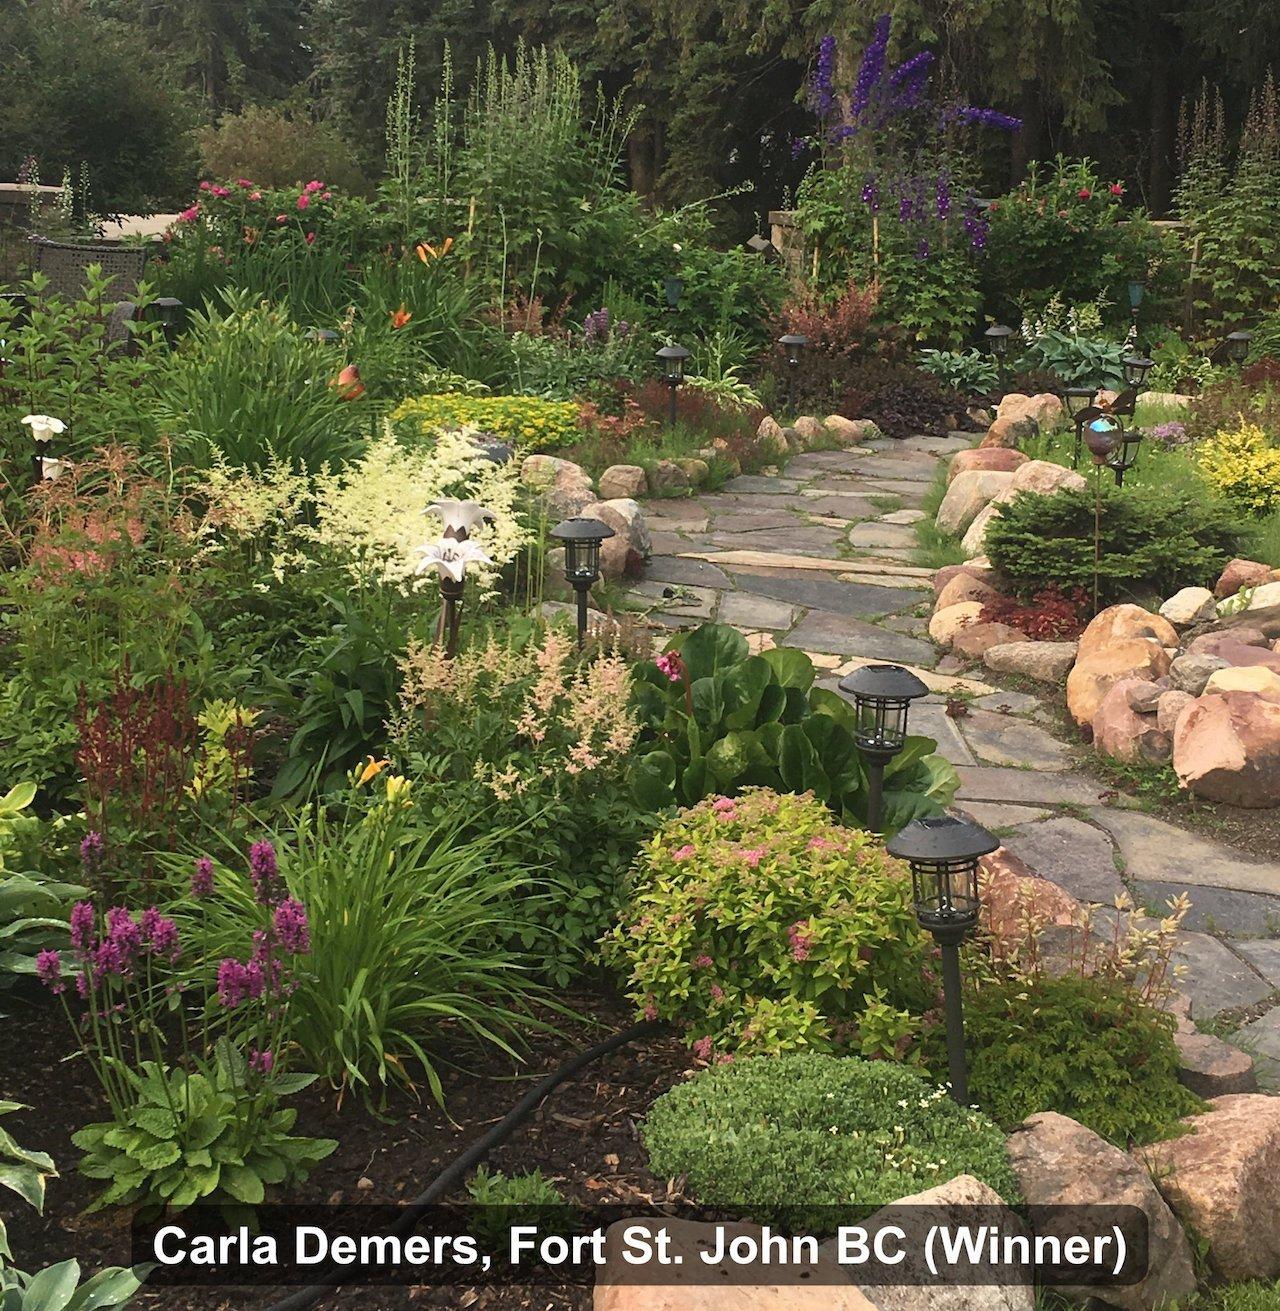 Grand Prize Winner - Carla Demers, Fort St. John BC